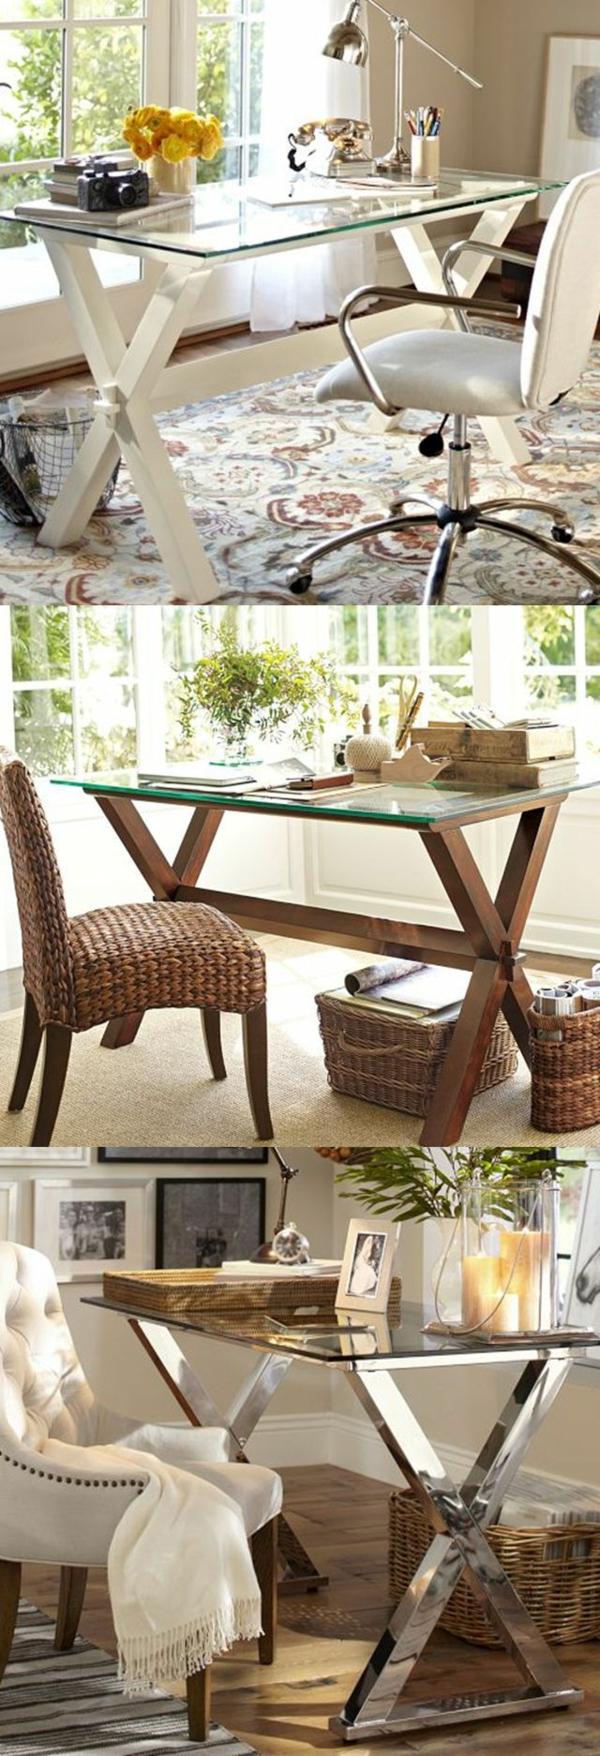 plateau-de-bureau-en-verre-designs-de-bureaux-originaux